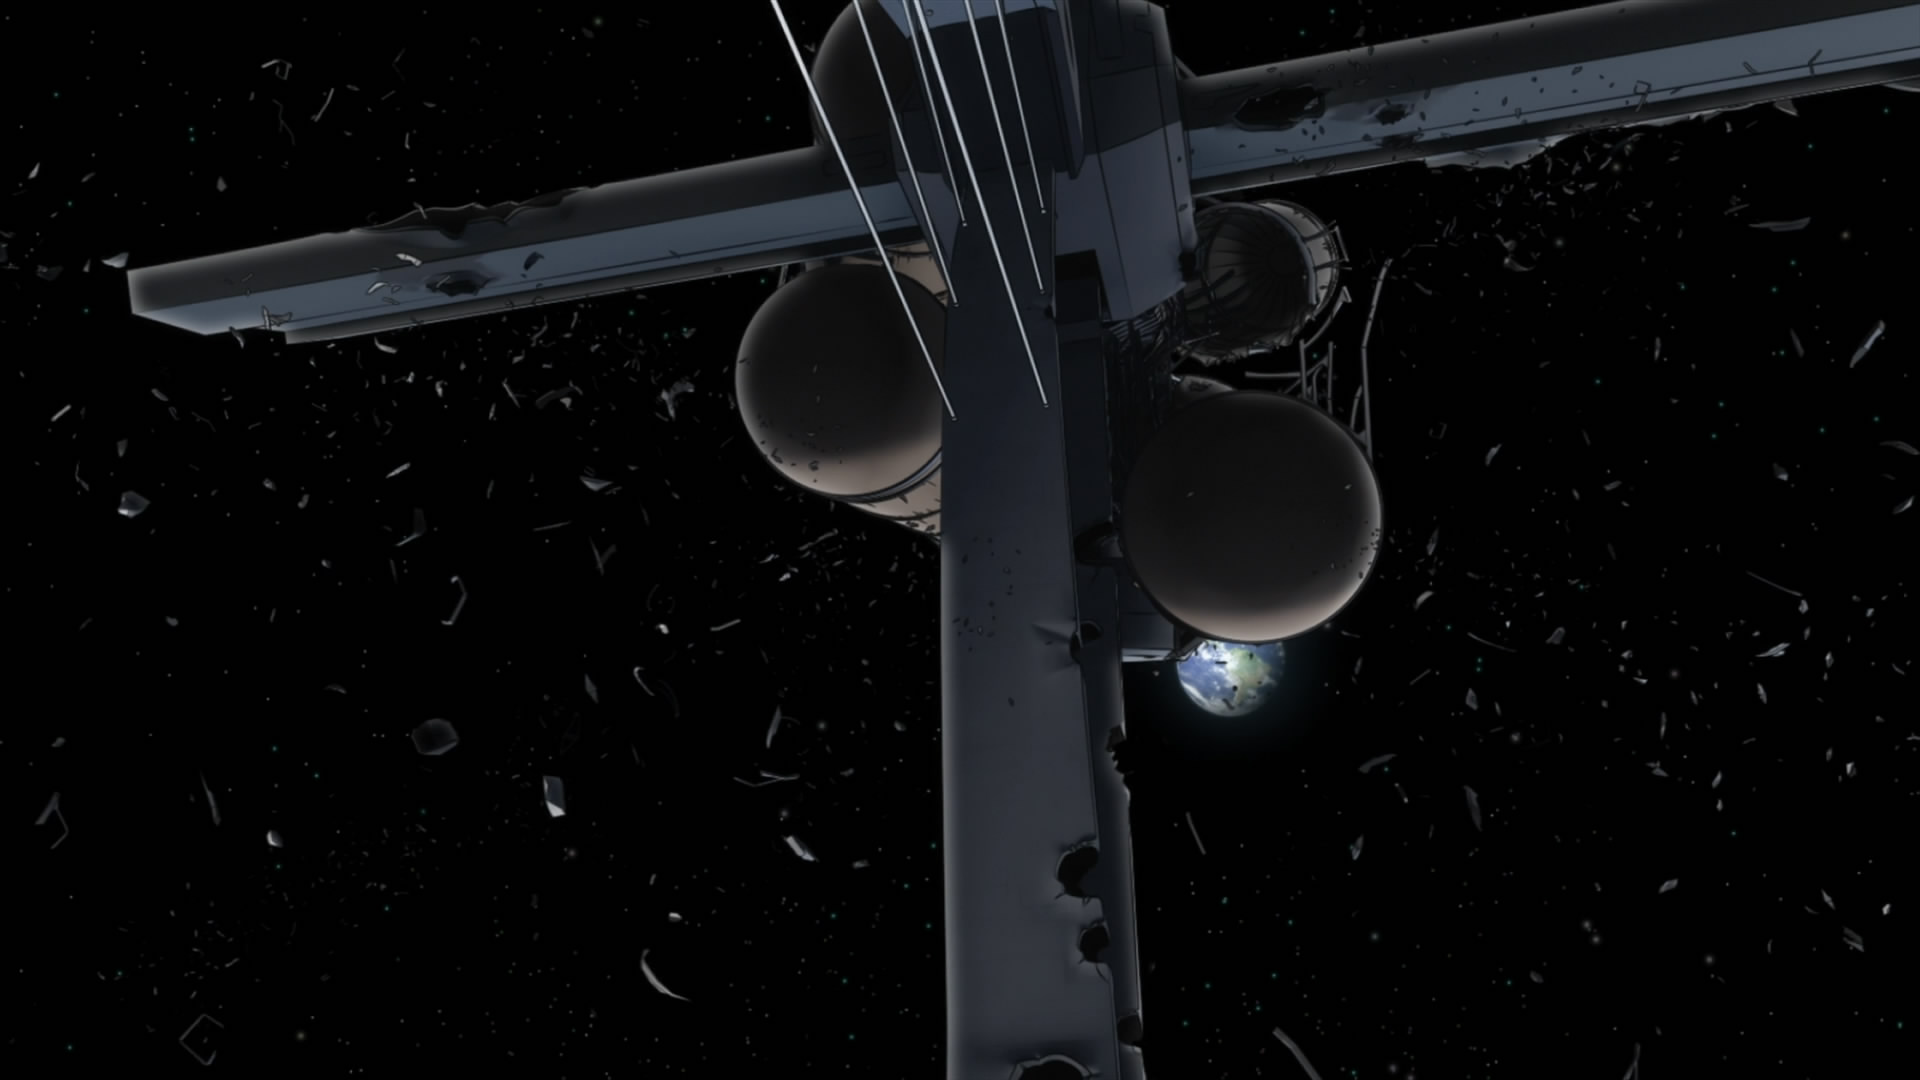 [gSS]_Mobile_Suit_Gundam_00_-_A_wakening_of_the_Trailblazer_(1080p)_[2B252856].mkv_snapshot_00.22.16_[2011.01.07_04.11.26]